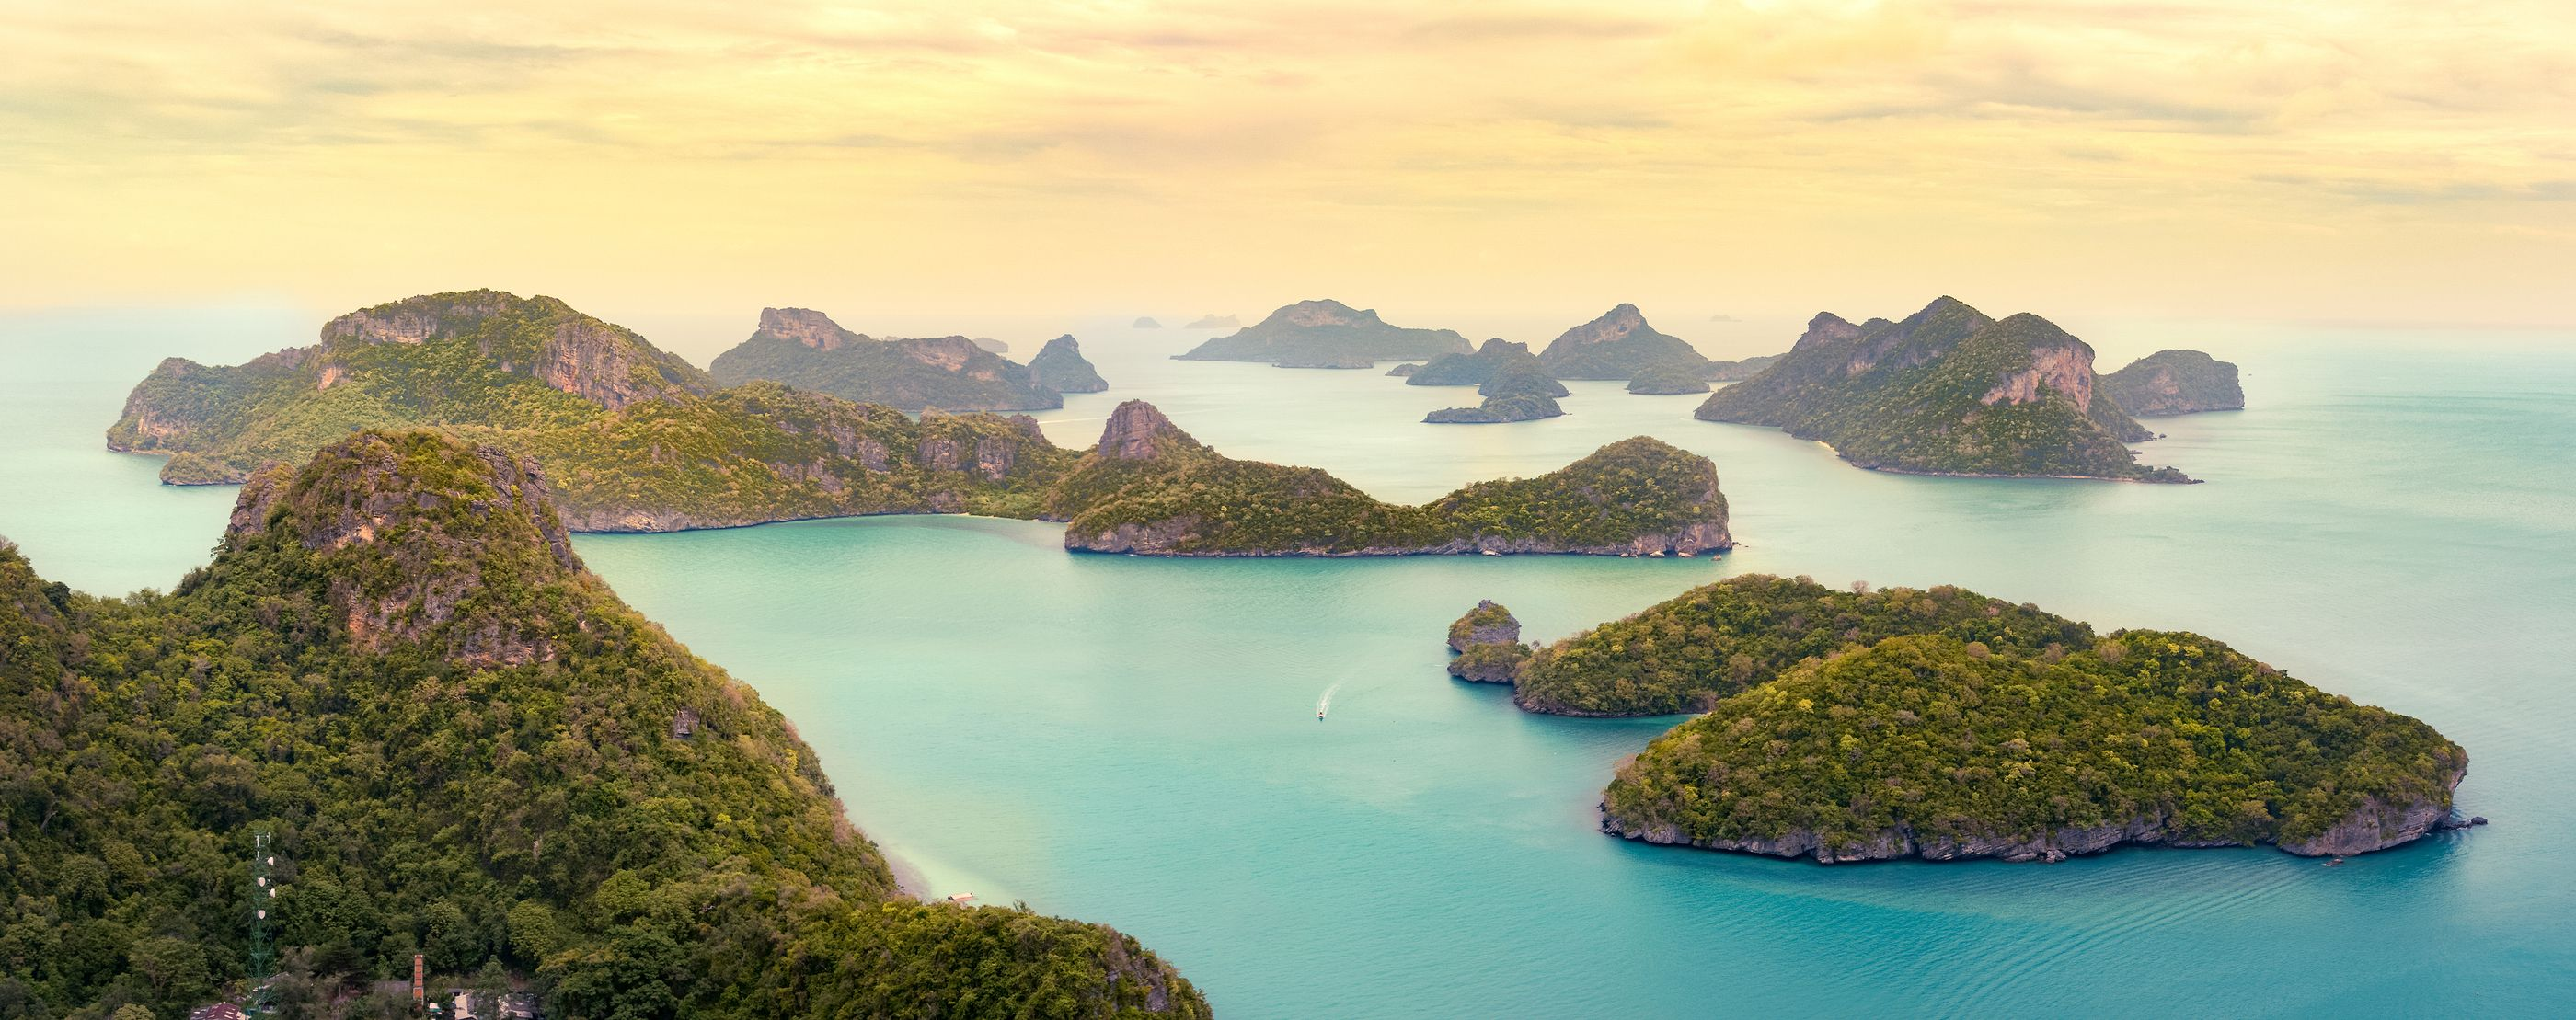 Morský NP Ang Thong